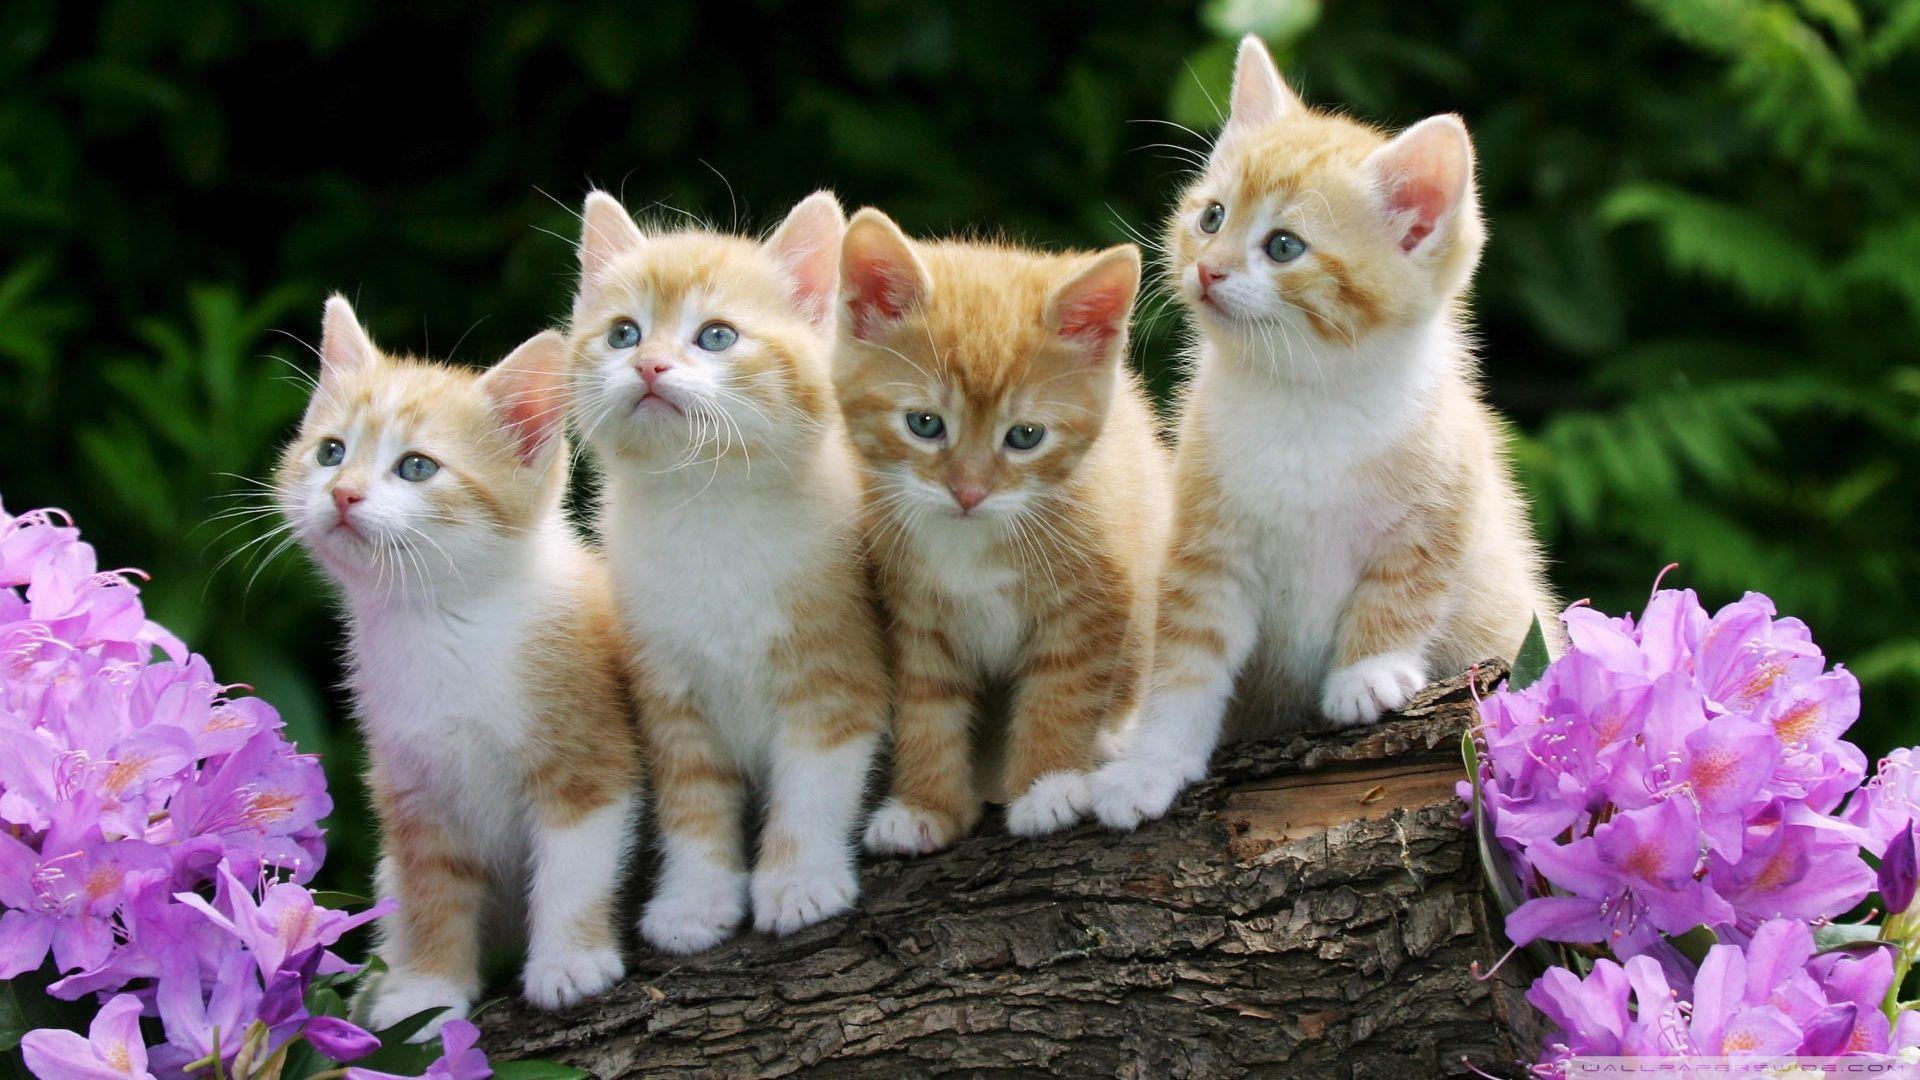 Hd 16 9 Kitten Wallpaper Beautiful Cats Kittens Cutest